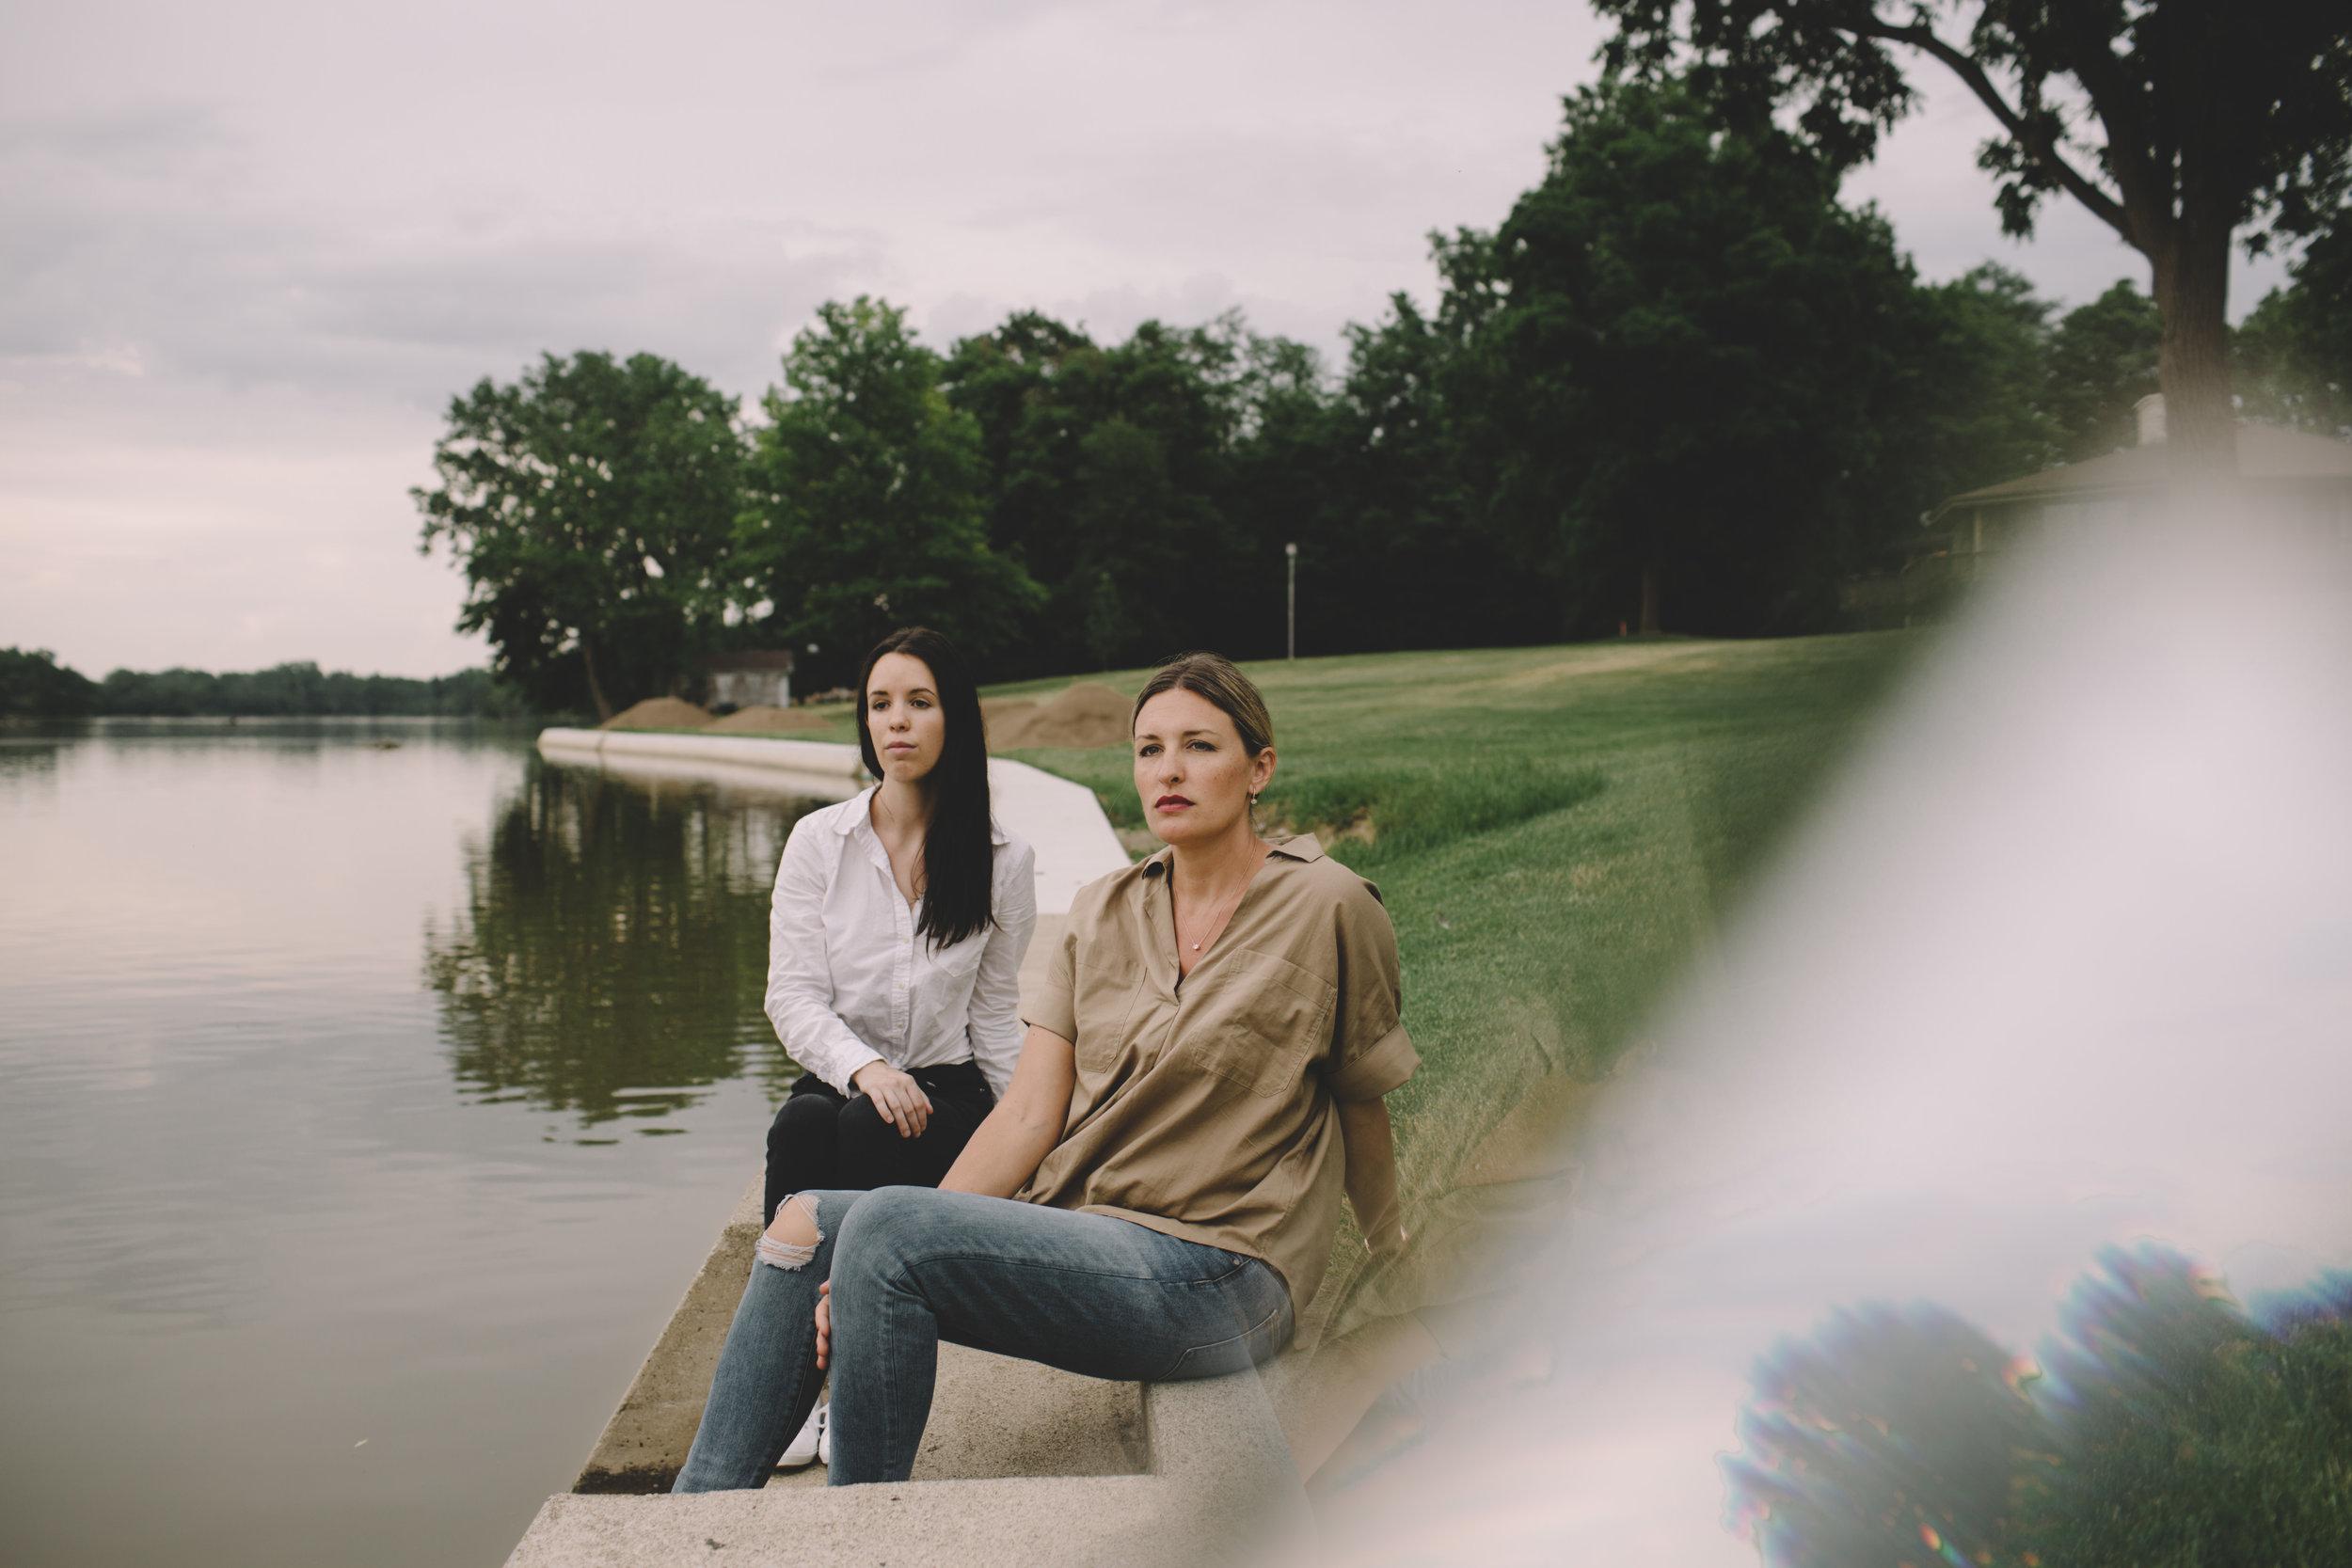 Bridget and Jennifer